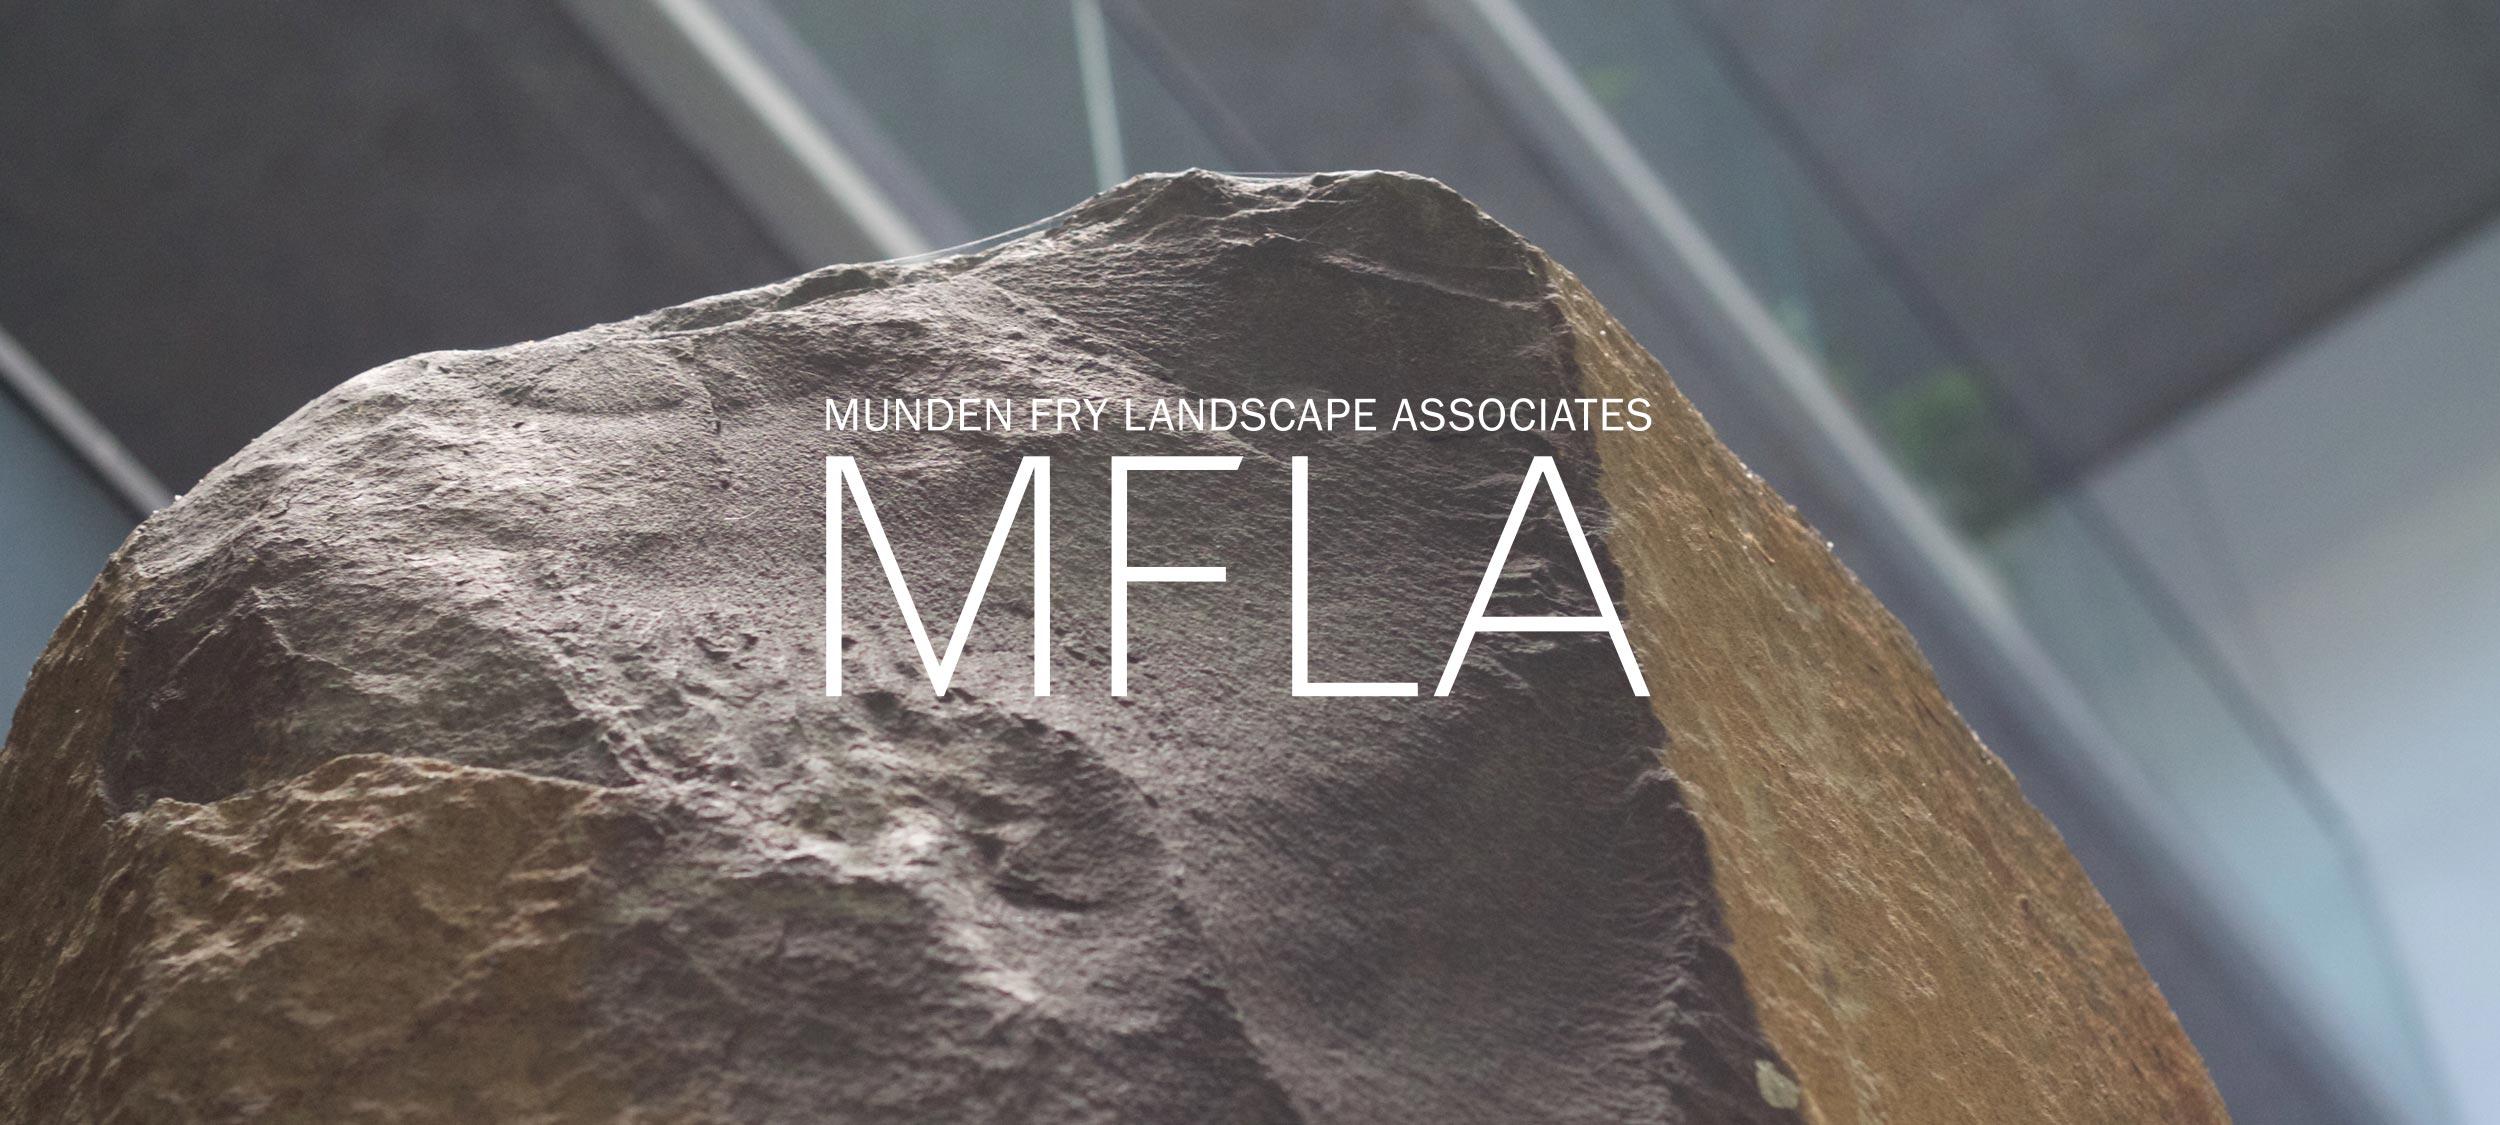 MFLA-Home-Gallery-13.jpg